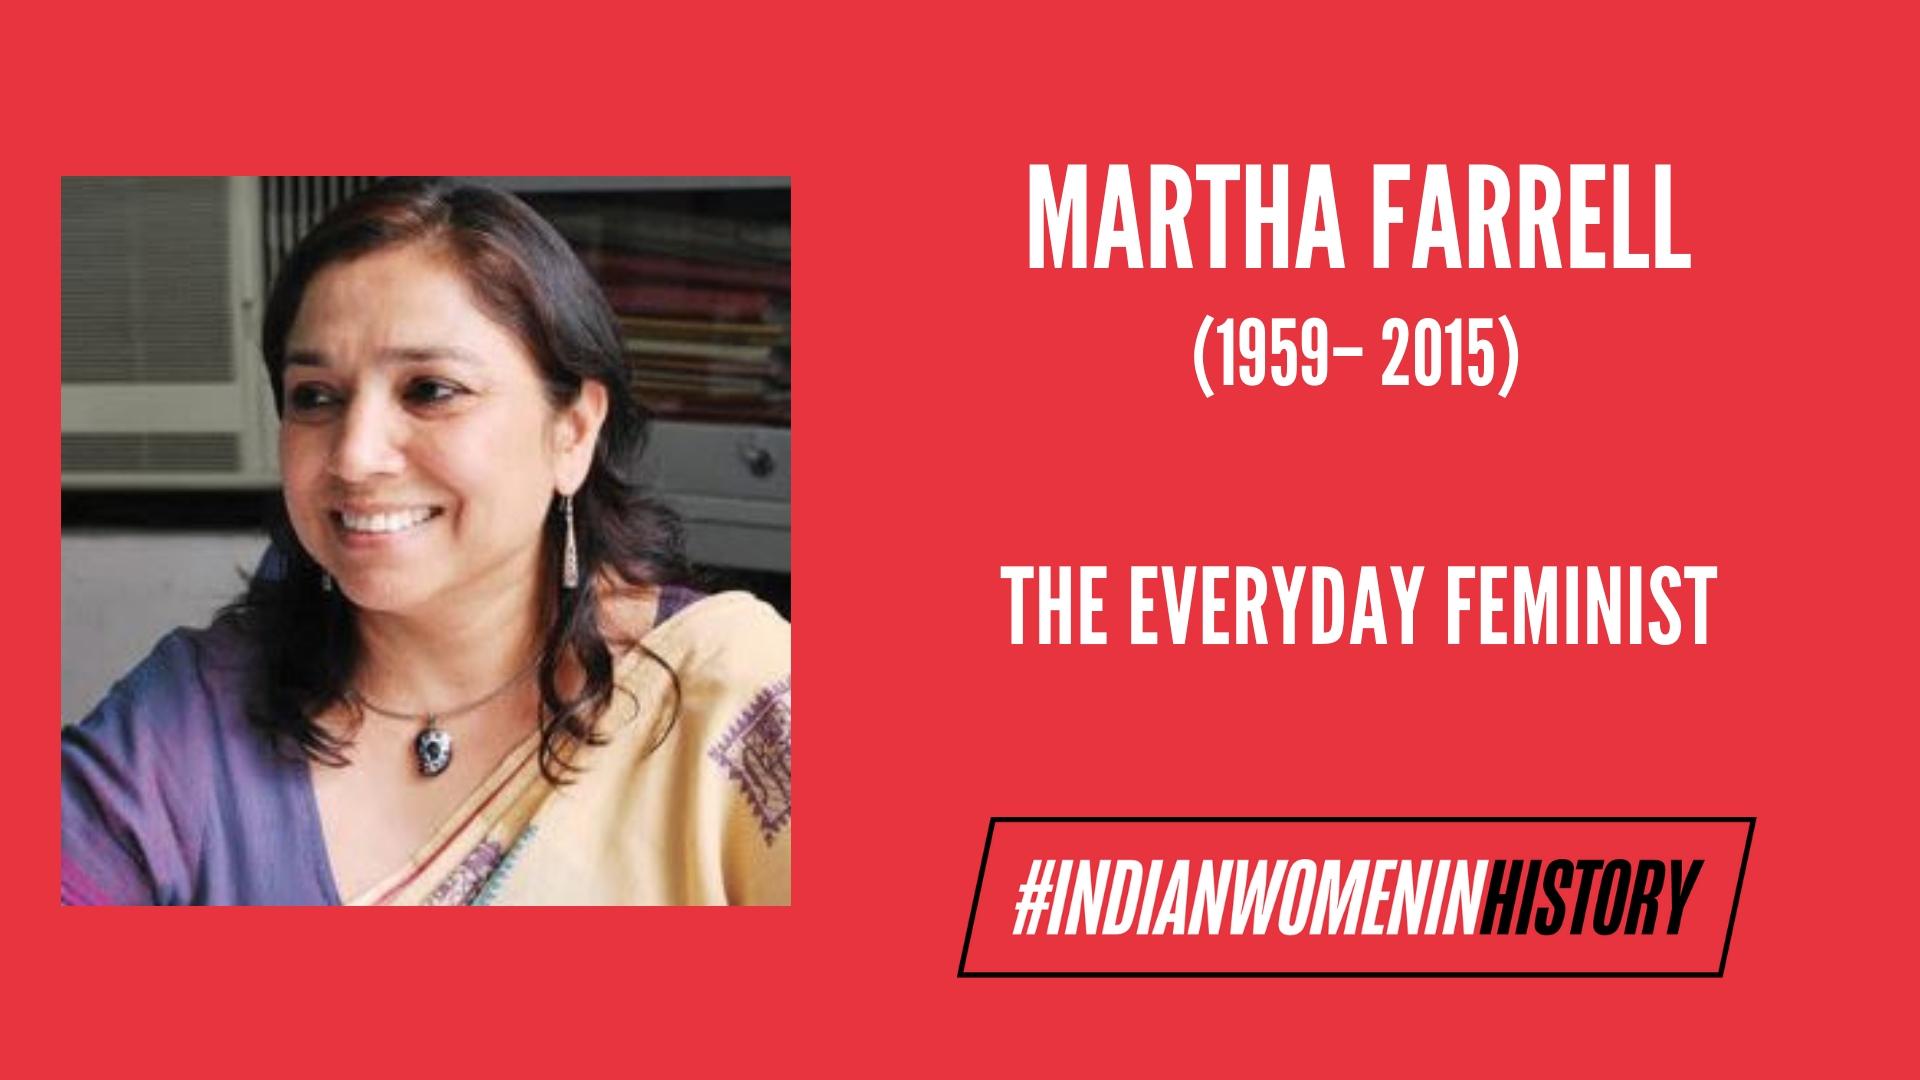 Martha Farrell: The 'Everyday Feminist' | #IndianWomenInHistory